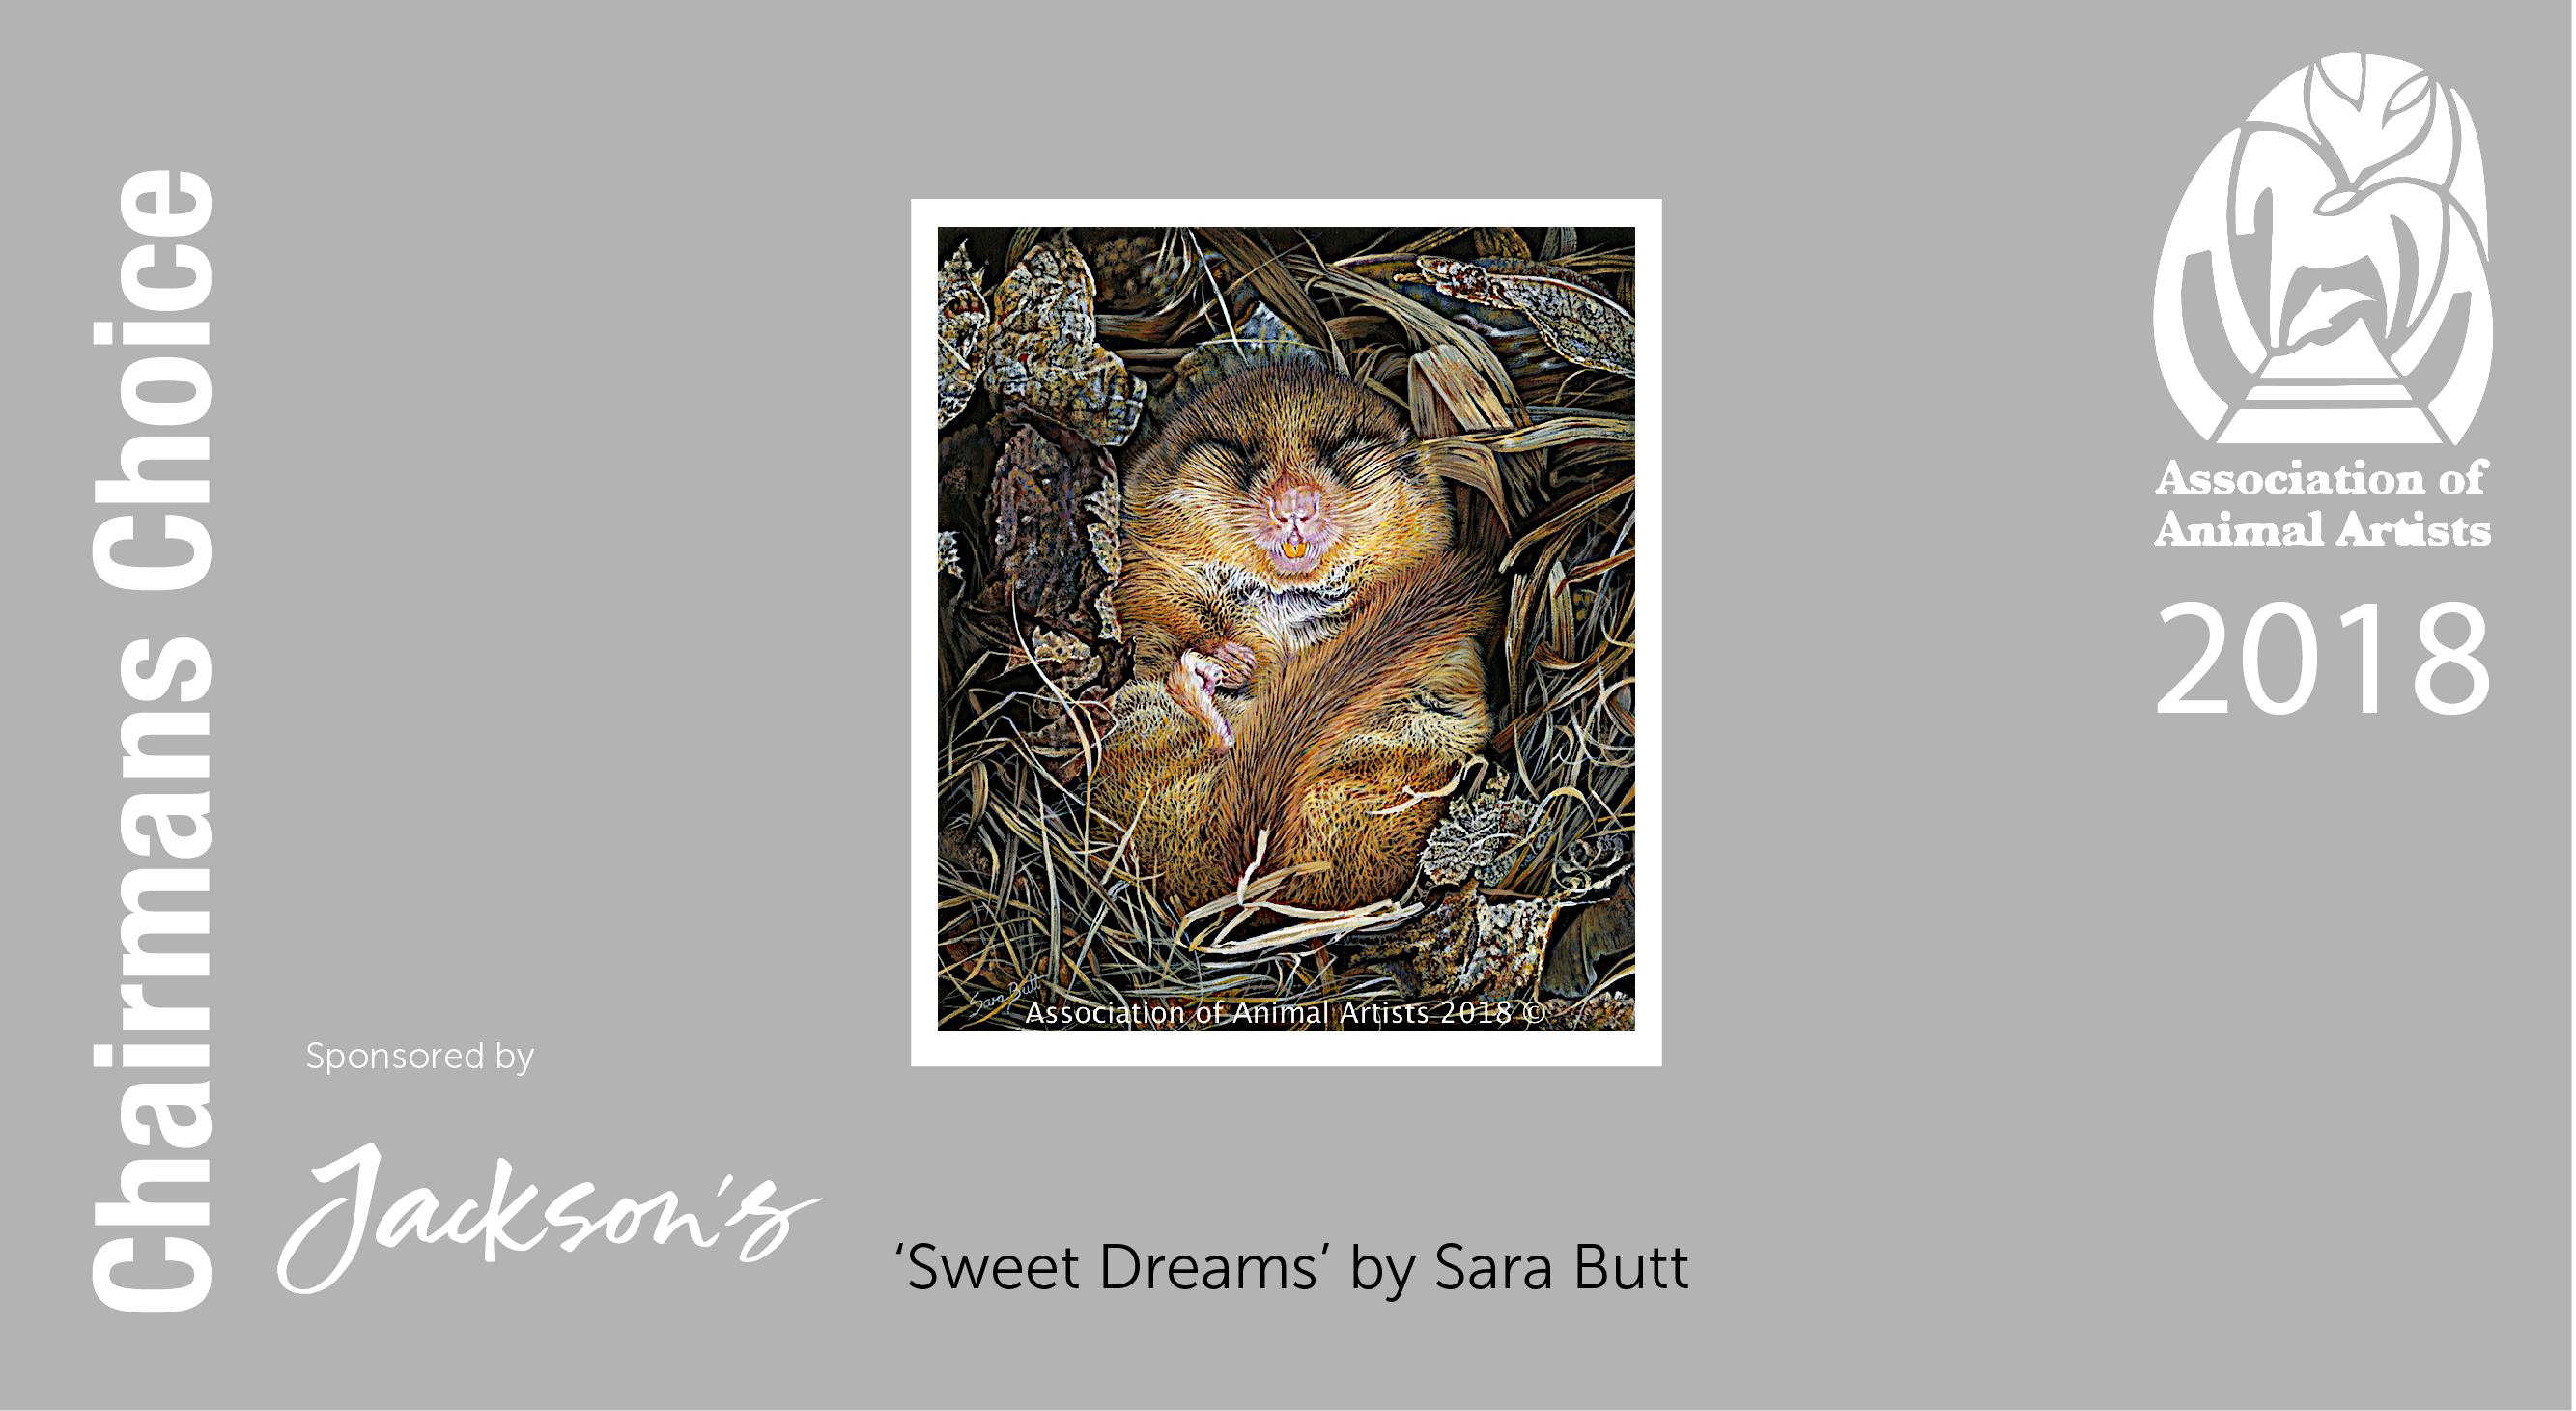 Slide of Sara Butts winning piece fot the Association of Animal Artists